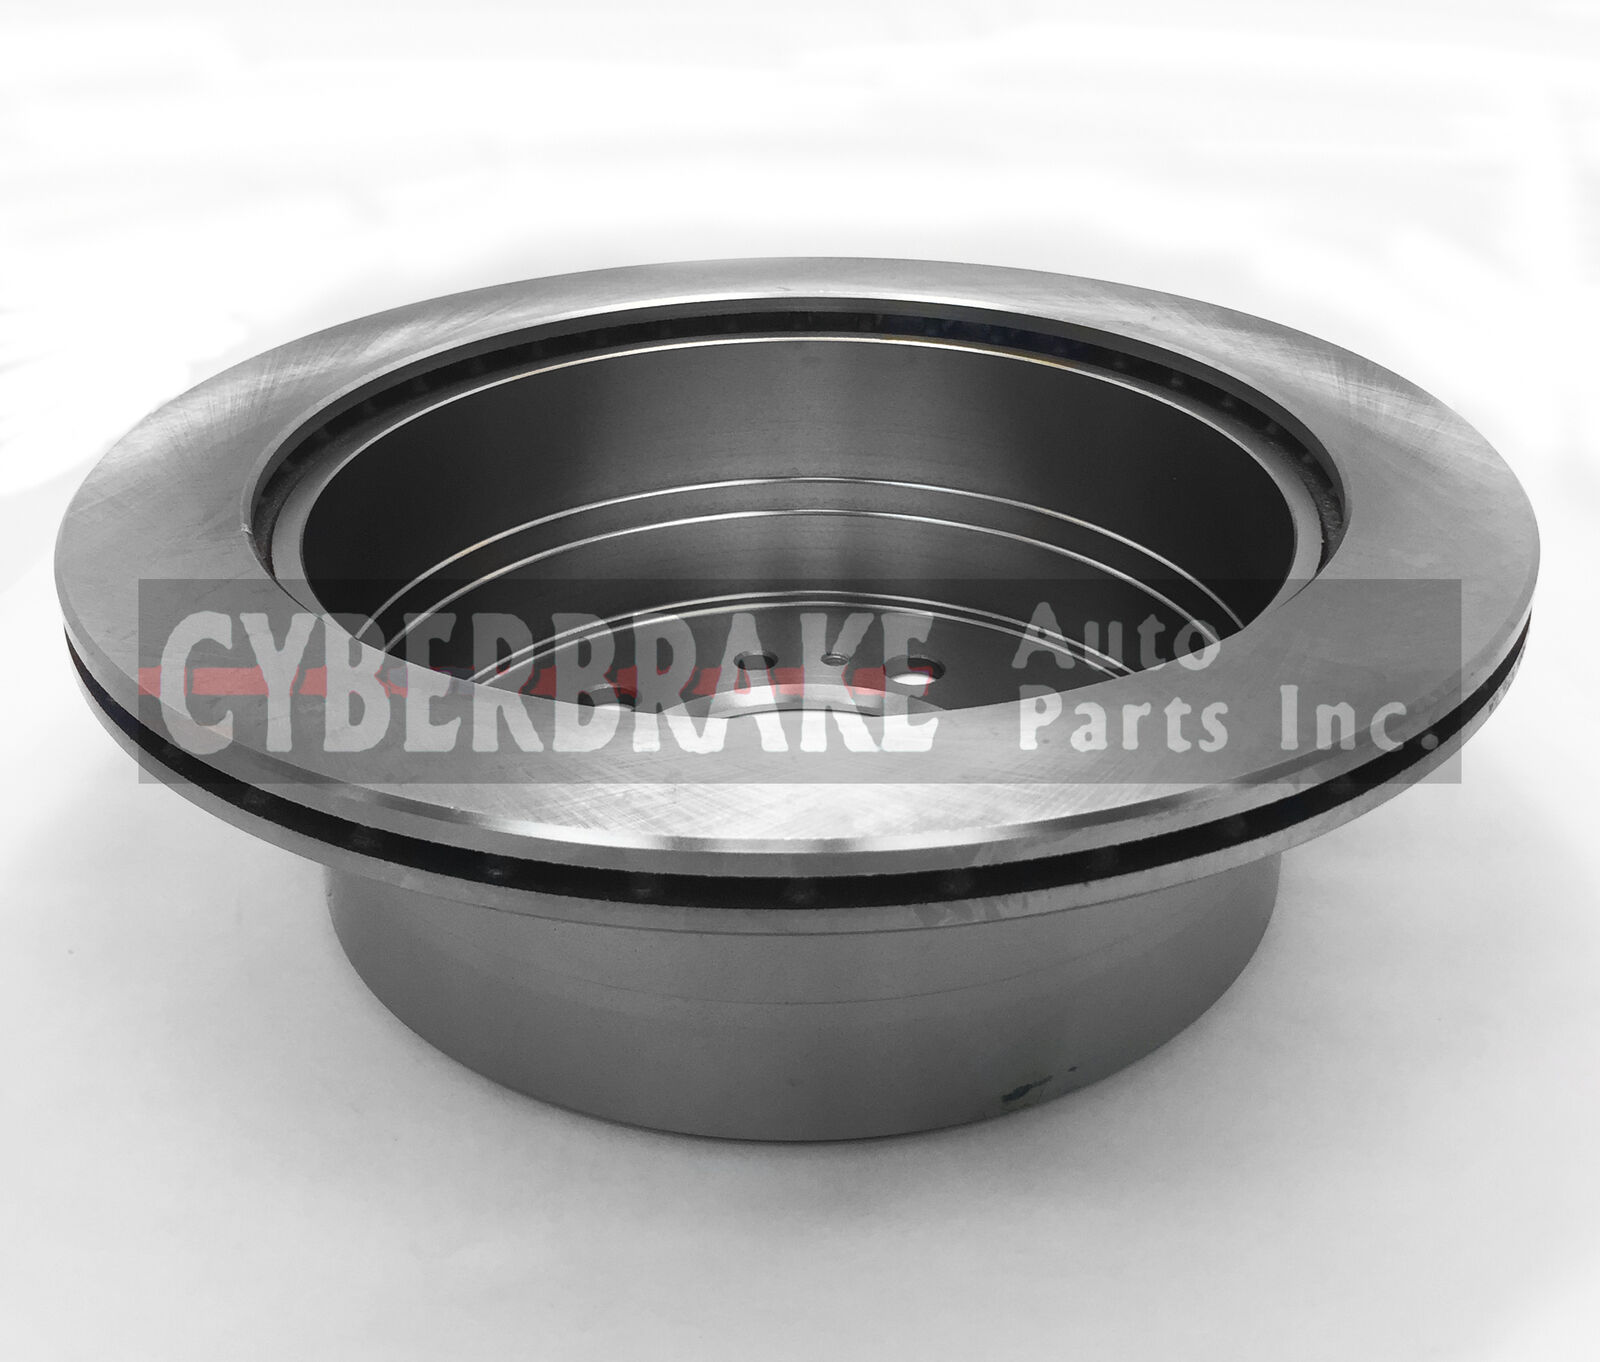 Headlamp Bezel Black Chrome Left Side for Jeep Wagoneer XJ 84-90 55008047 Crown